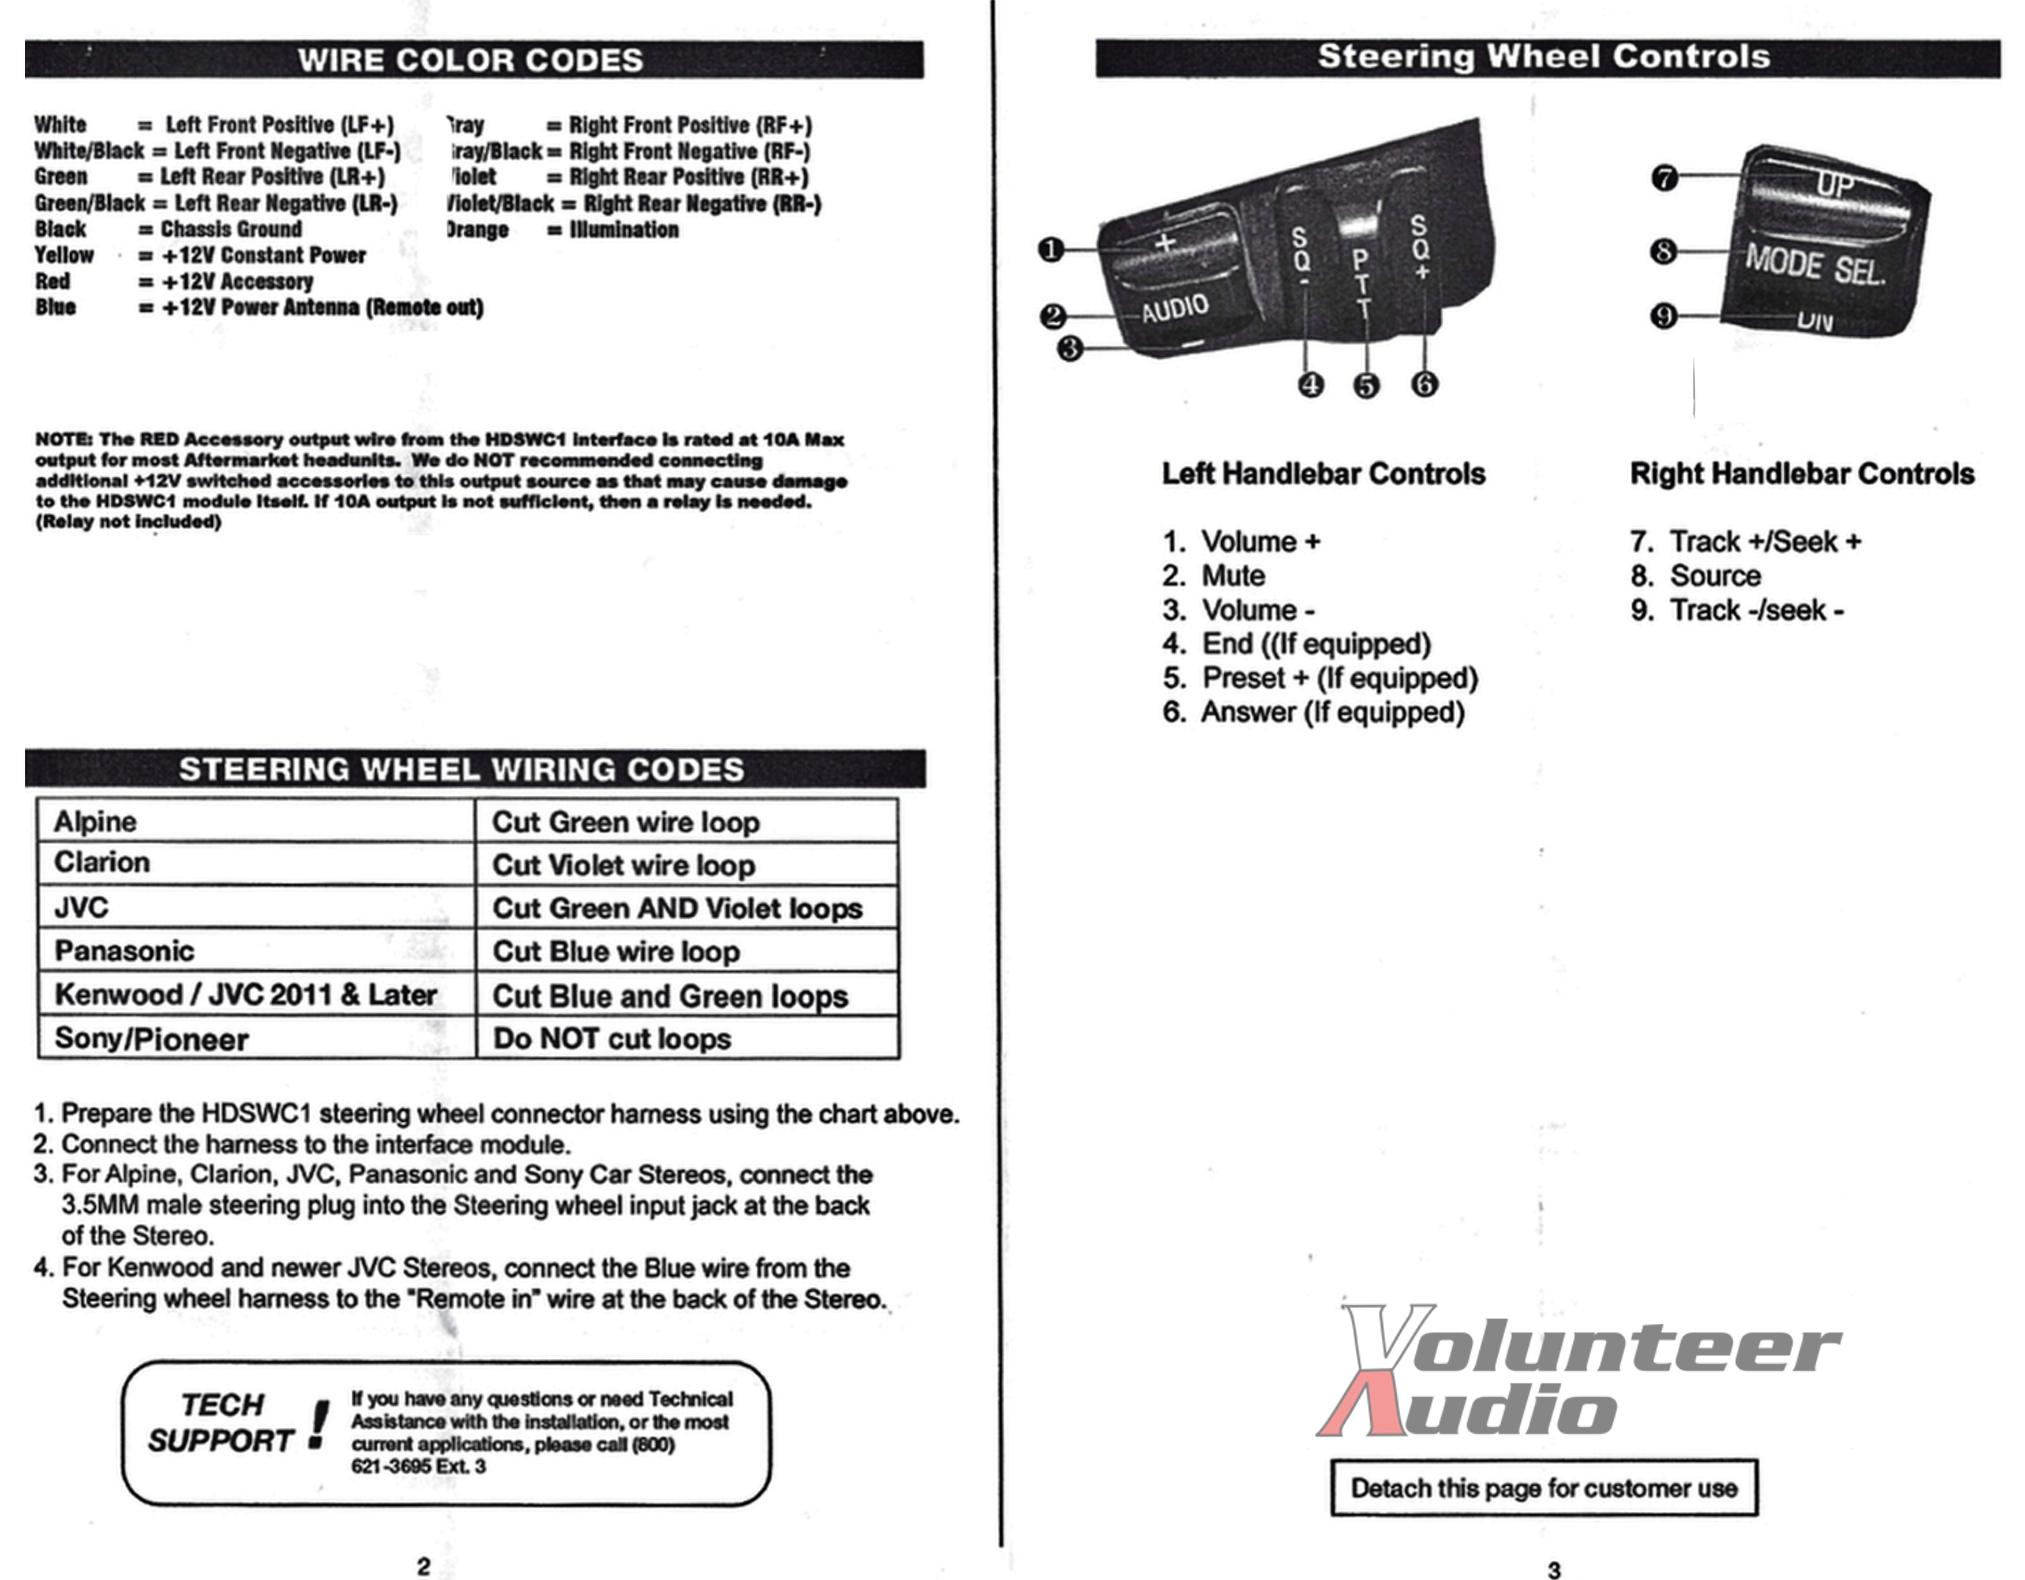 [SCHEMATICS_49CH]  🏆 [DIAGRAM in Pictures Database] Camaro Scosche Wiring Harness Diagrams  Just Download or Read Harness Diagrams - CHROMATIC-DIAGRAM.ONYXUM.COM   Camaro Scosche Wiring Harness Diagrams      Complete Diagram Picture Database - Onyxum.com